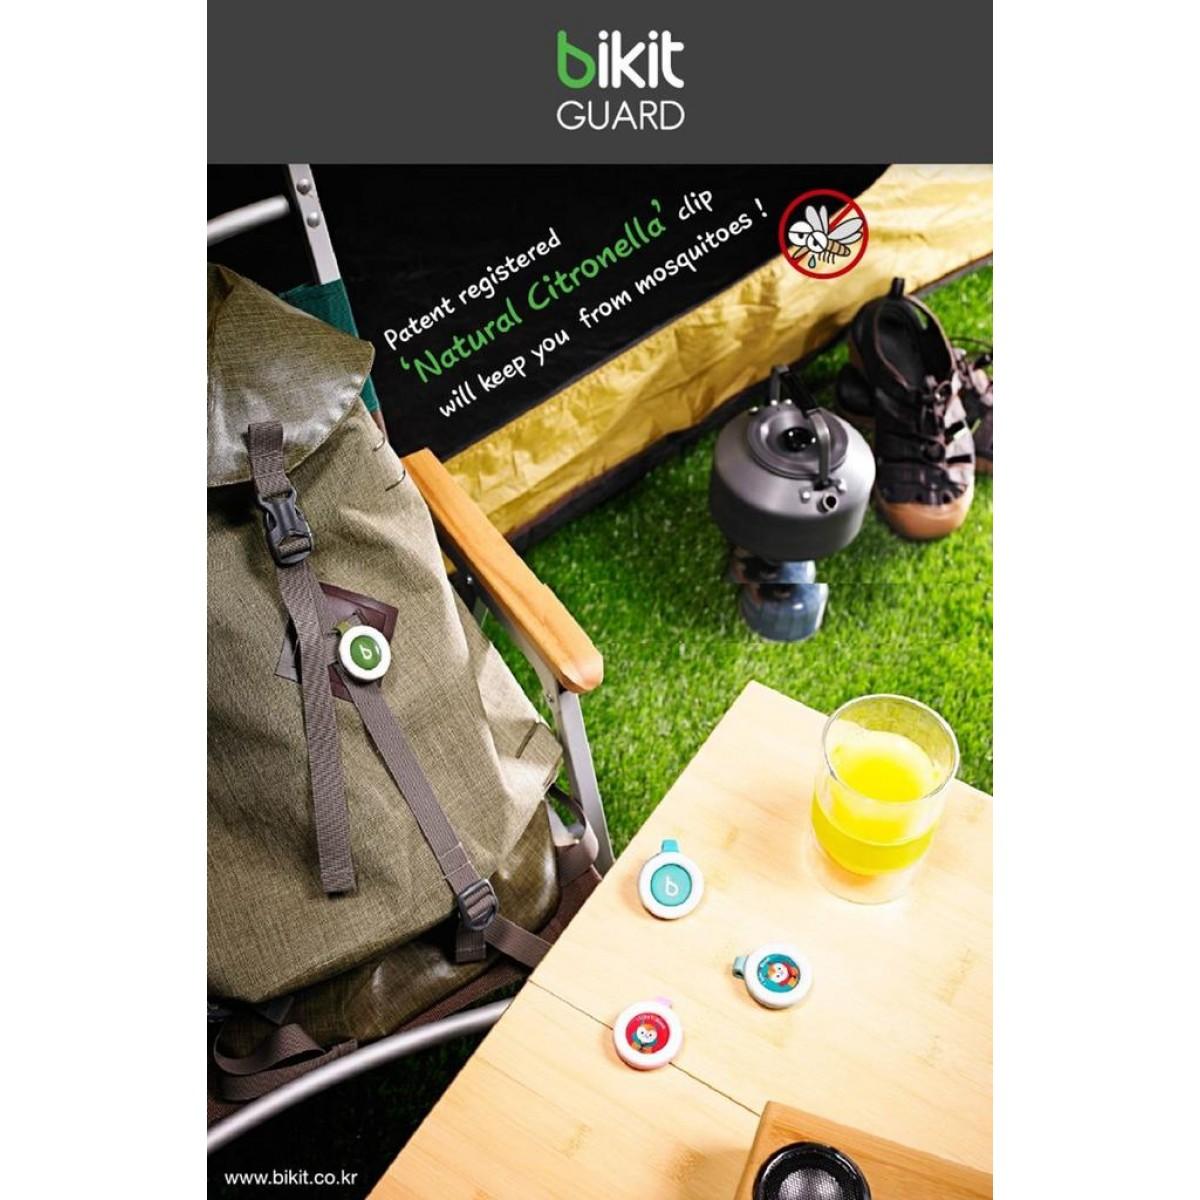 Bikit Guard Moisquito Repellent Clip - Natural Ingredient - Assorted Design